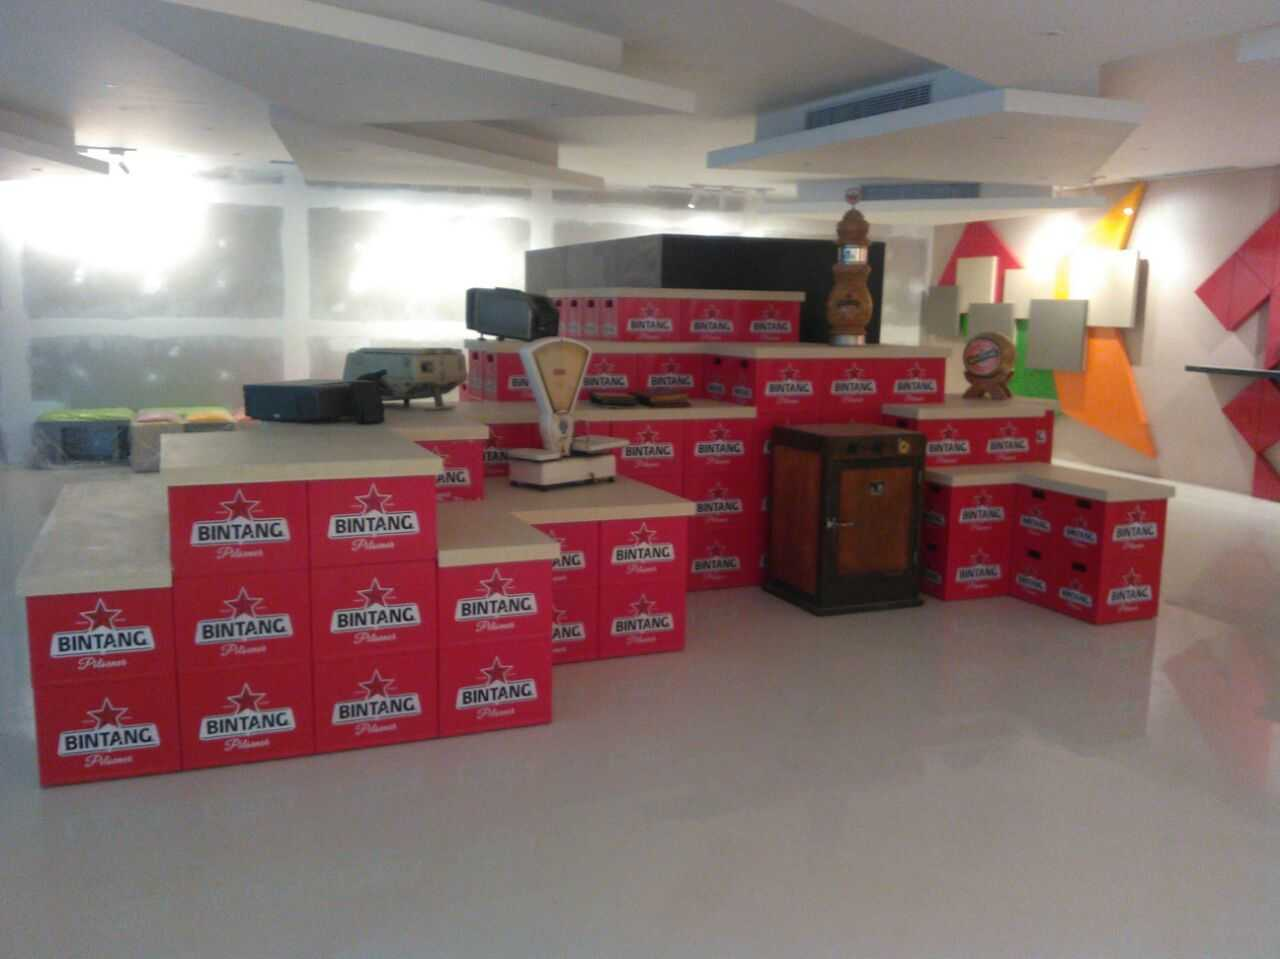 Foto inspirasi ide desain display area minimalis Display area office oleh fahrudin yunianto di Arsitag